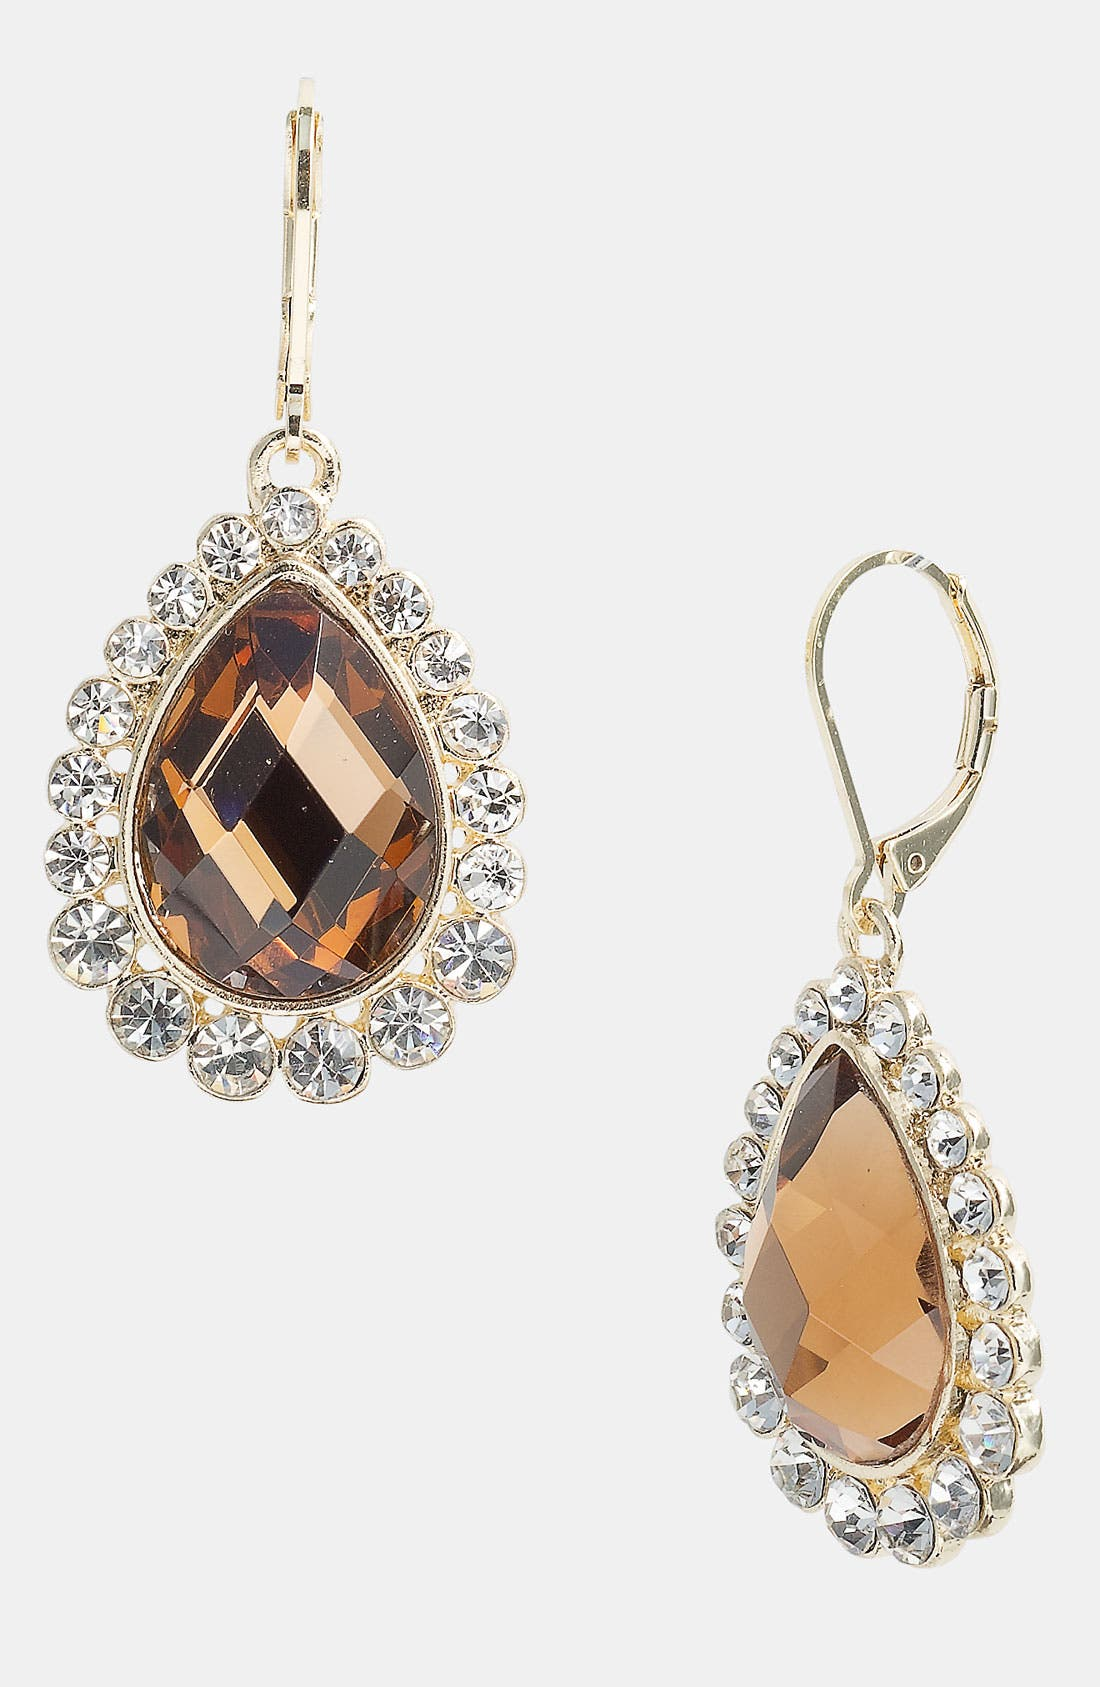 Main Image - Nordstrom 'Romantics' Drop Earrings